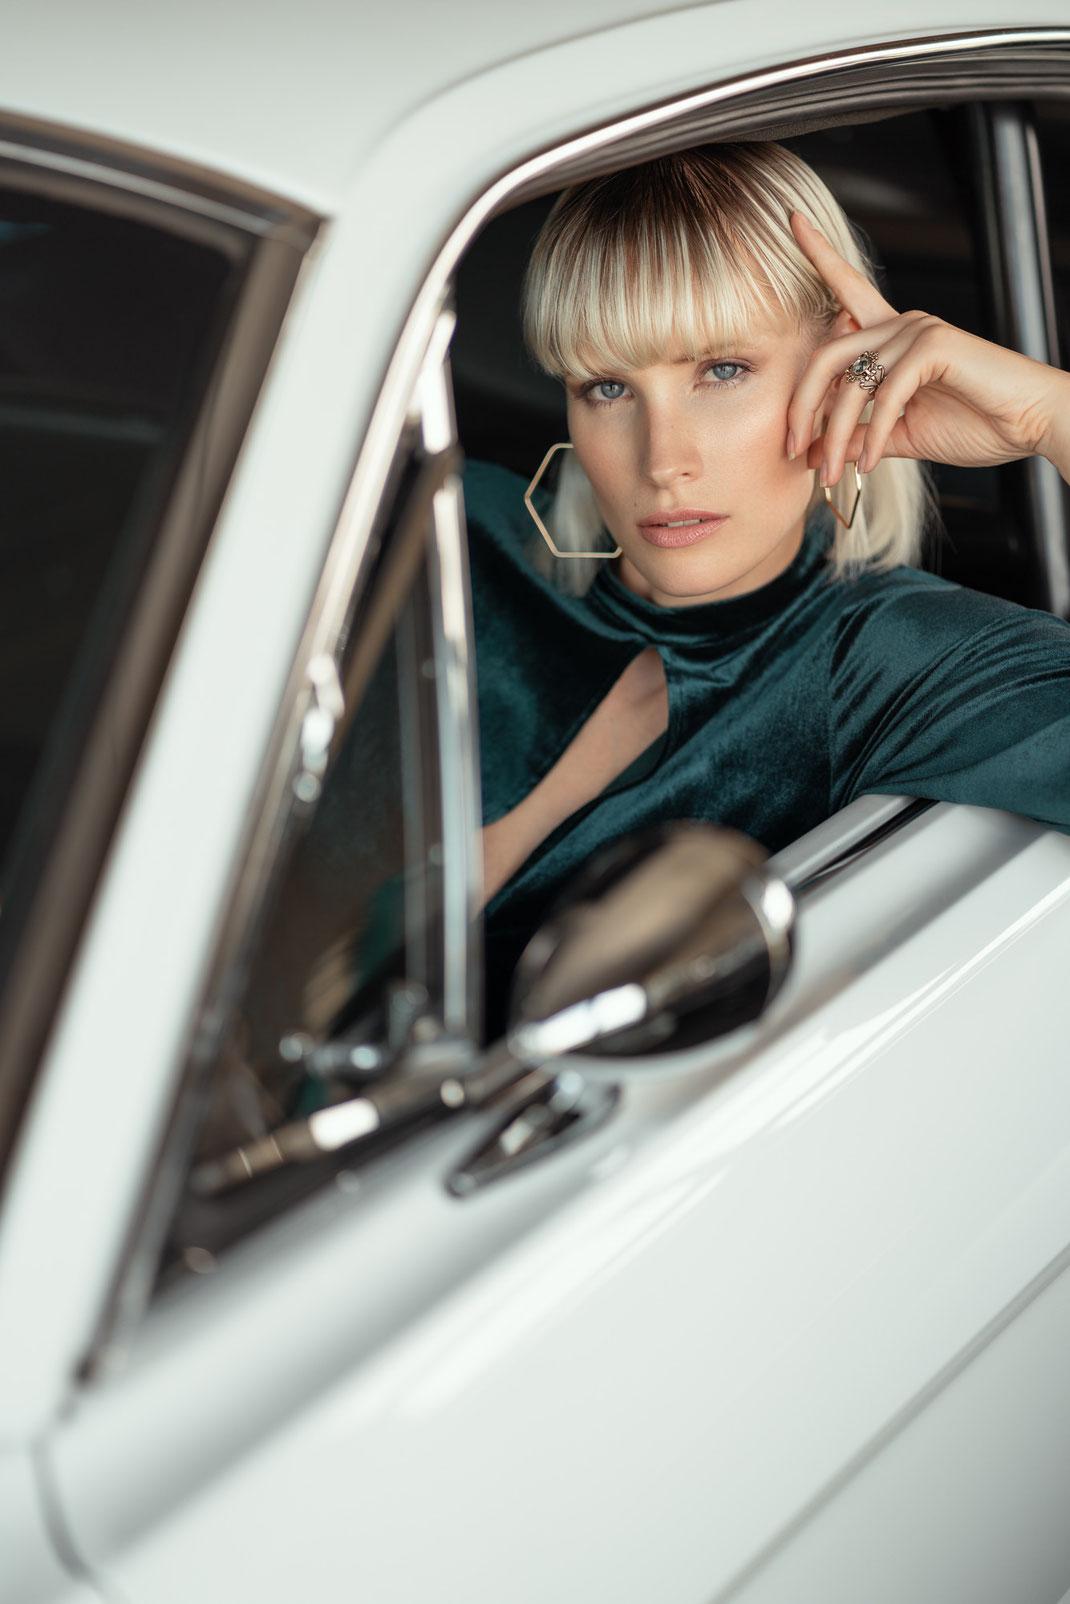 Ambition is a dream with a V8 engine (Elvis Presley) - Jane - Markus Hertzsch - Ford - Mustang - V8 - Car - Model - Girl - Portrait -  Look - Colorgrading - Mustang - Classiccar - Oldtimer